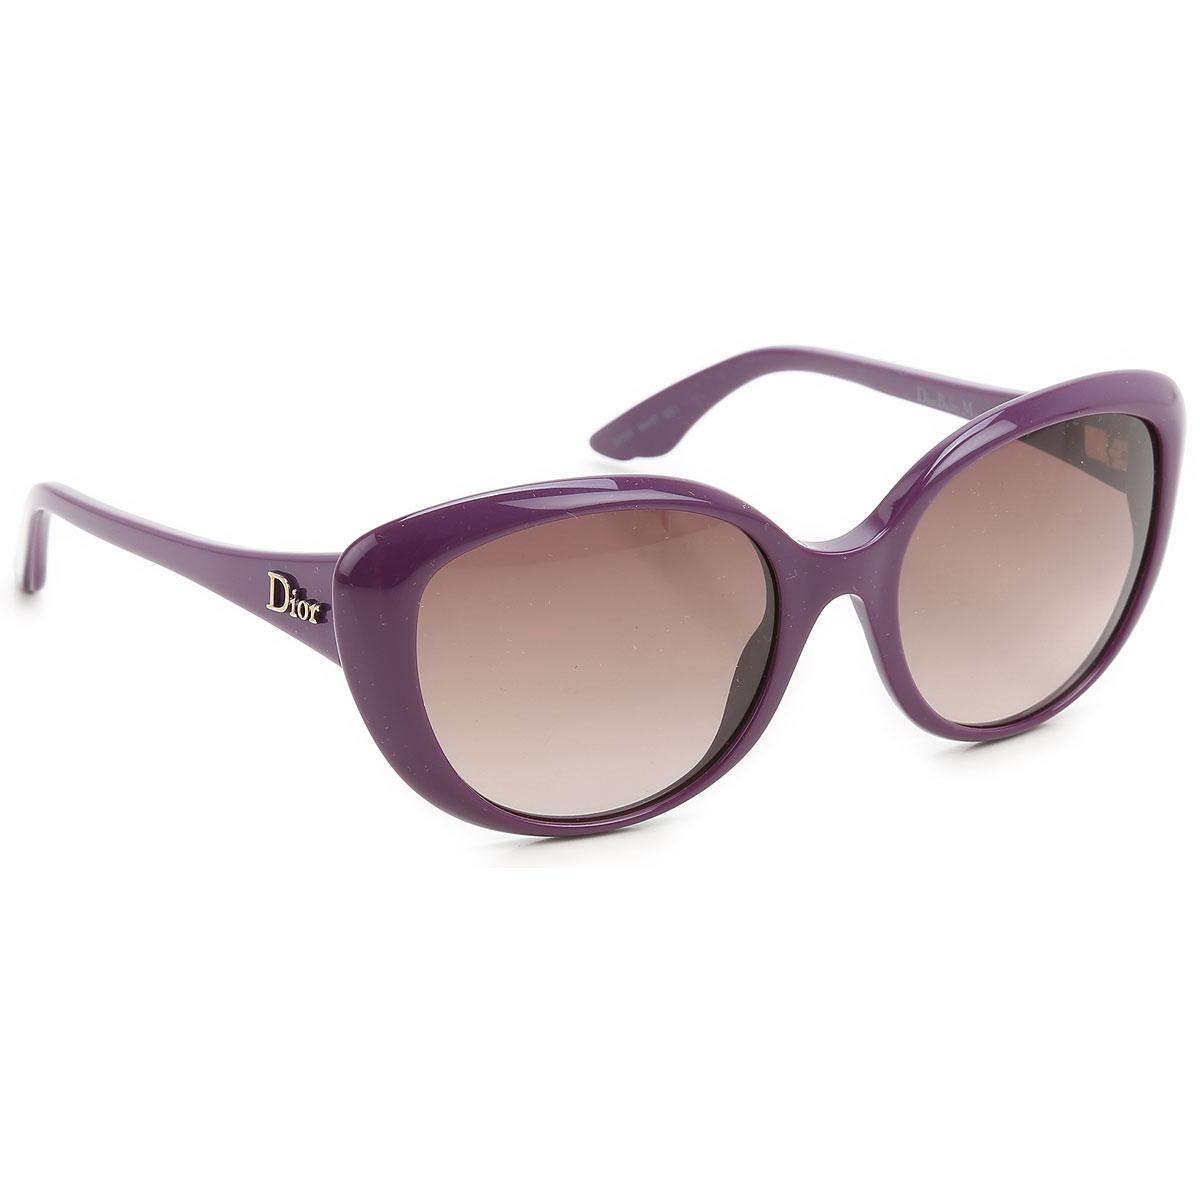 Christian Dior Kids Sunglasses for Girls On Sale, 2019